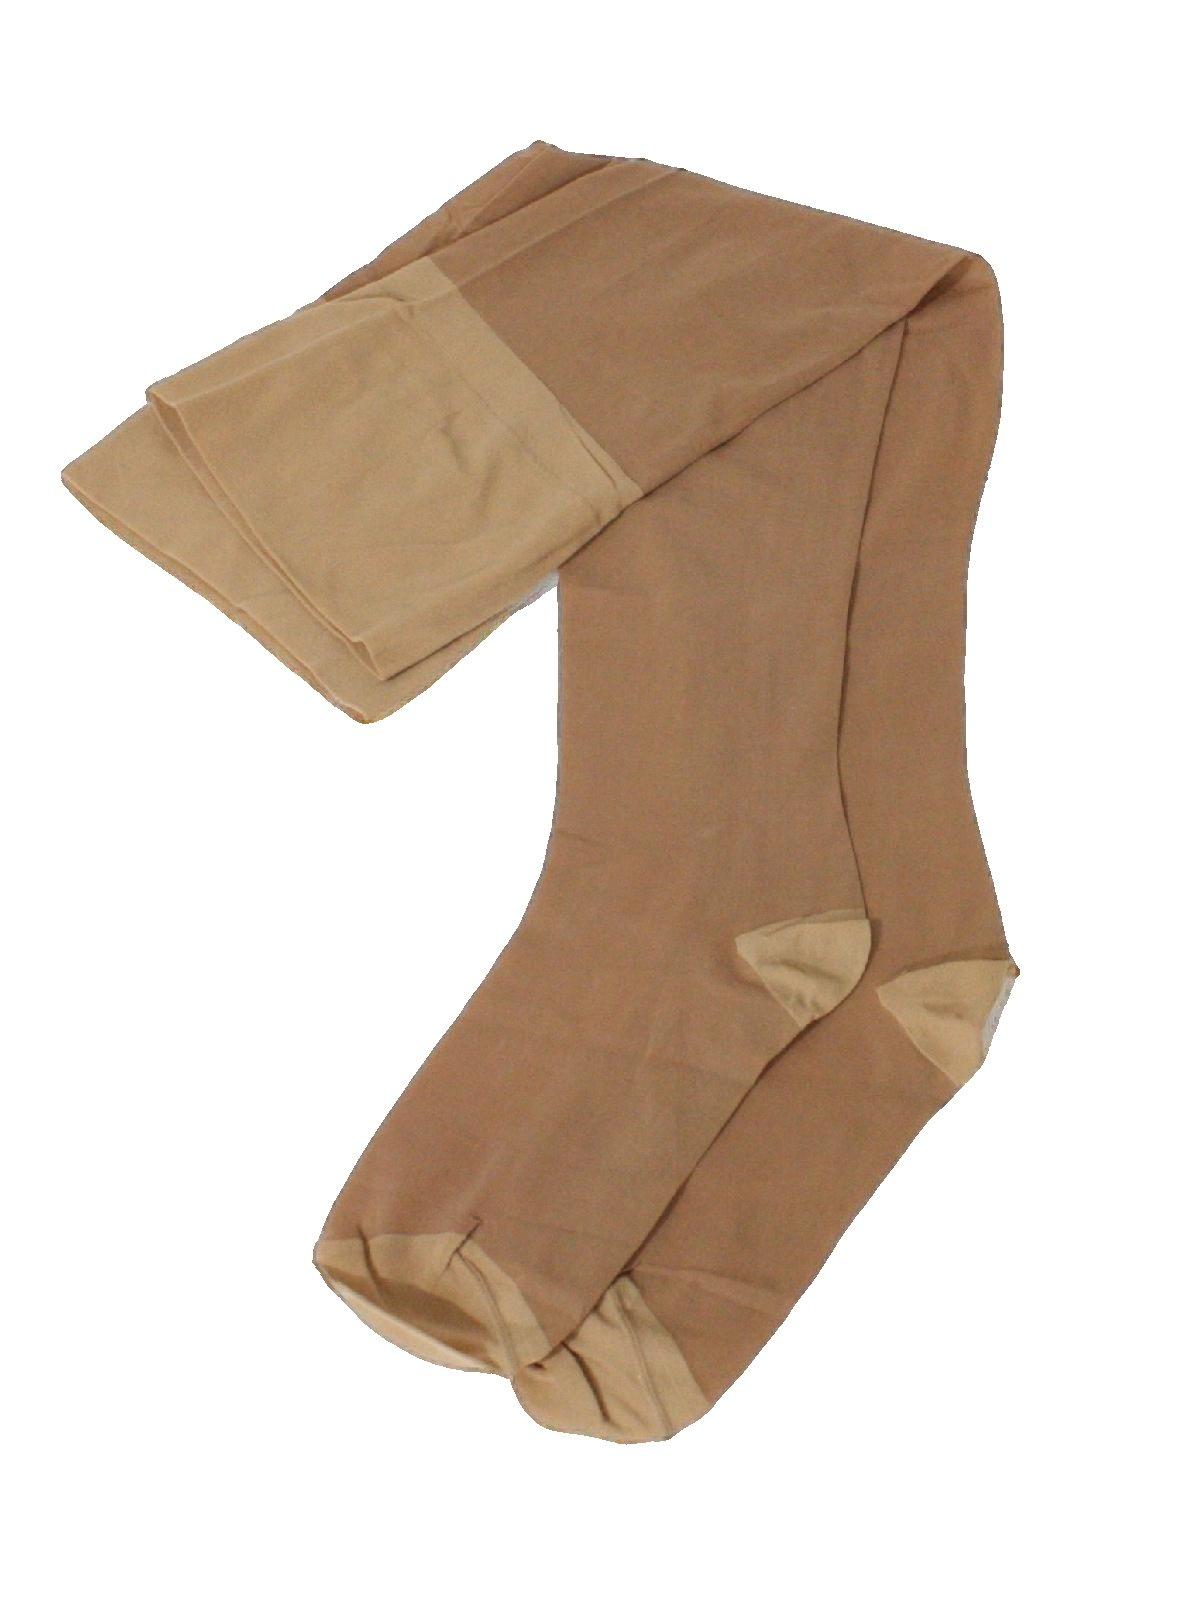 1960's Retro Socks